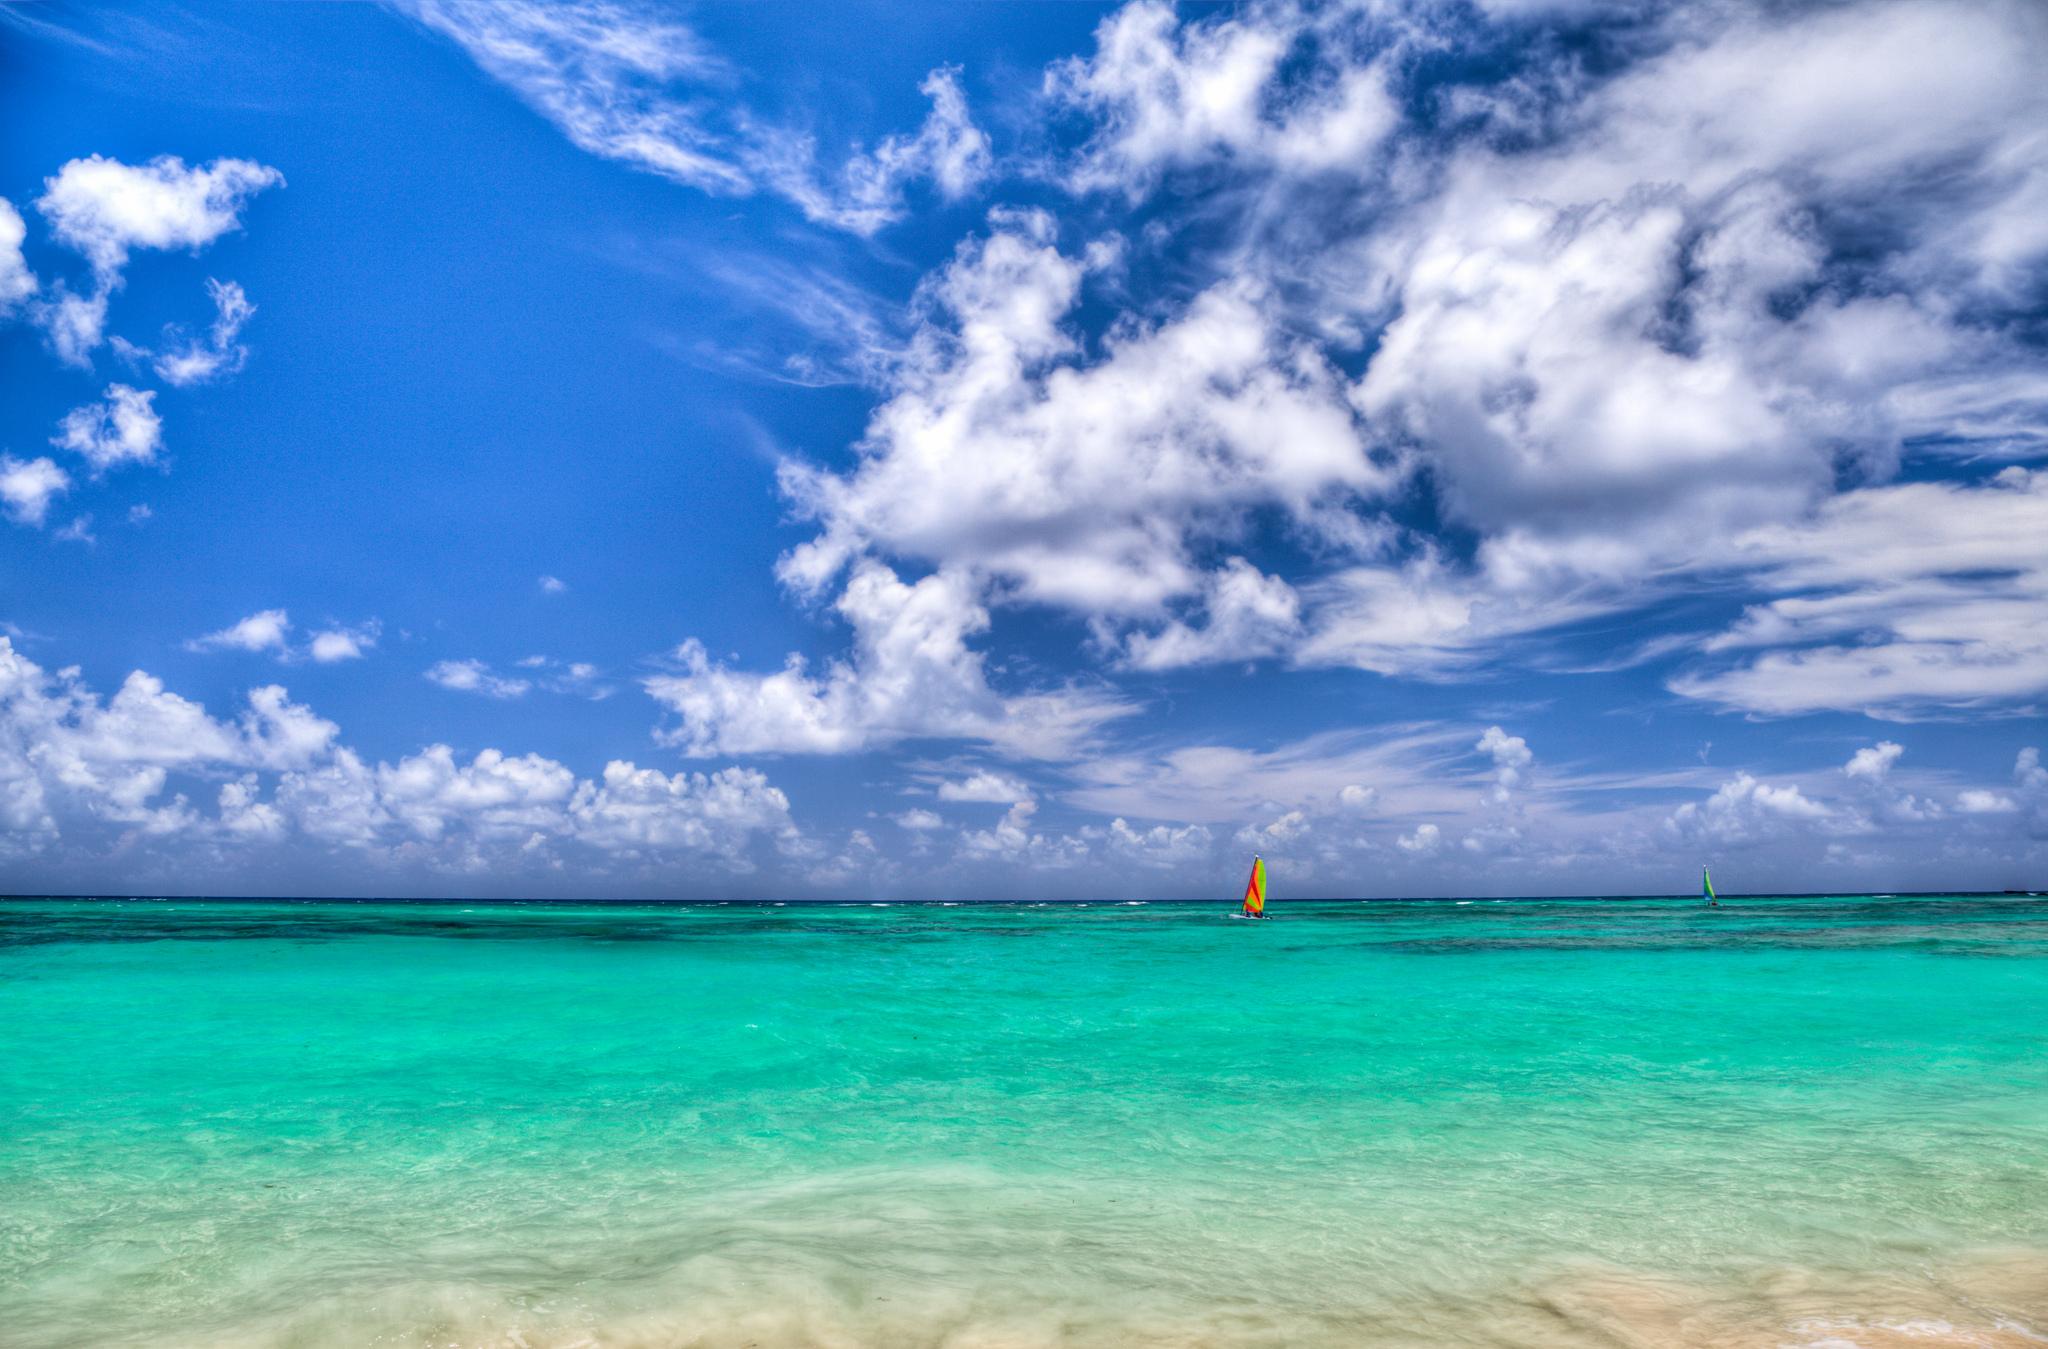 Punta_Cana.jpg (2048×1349)